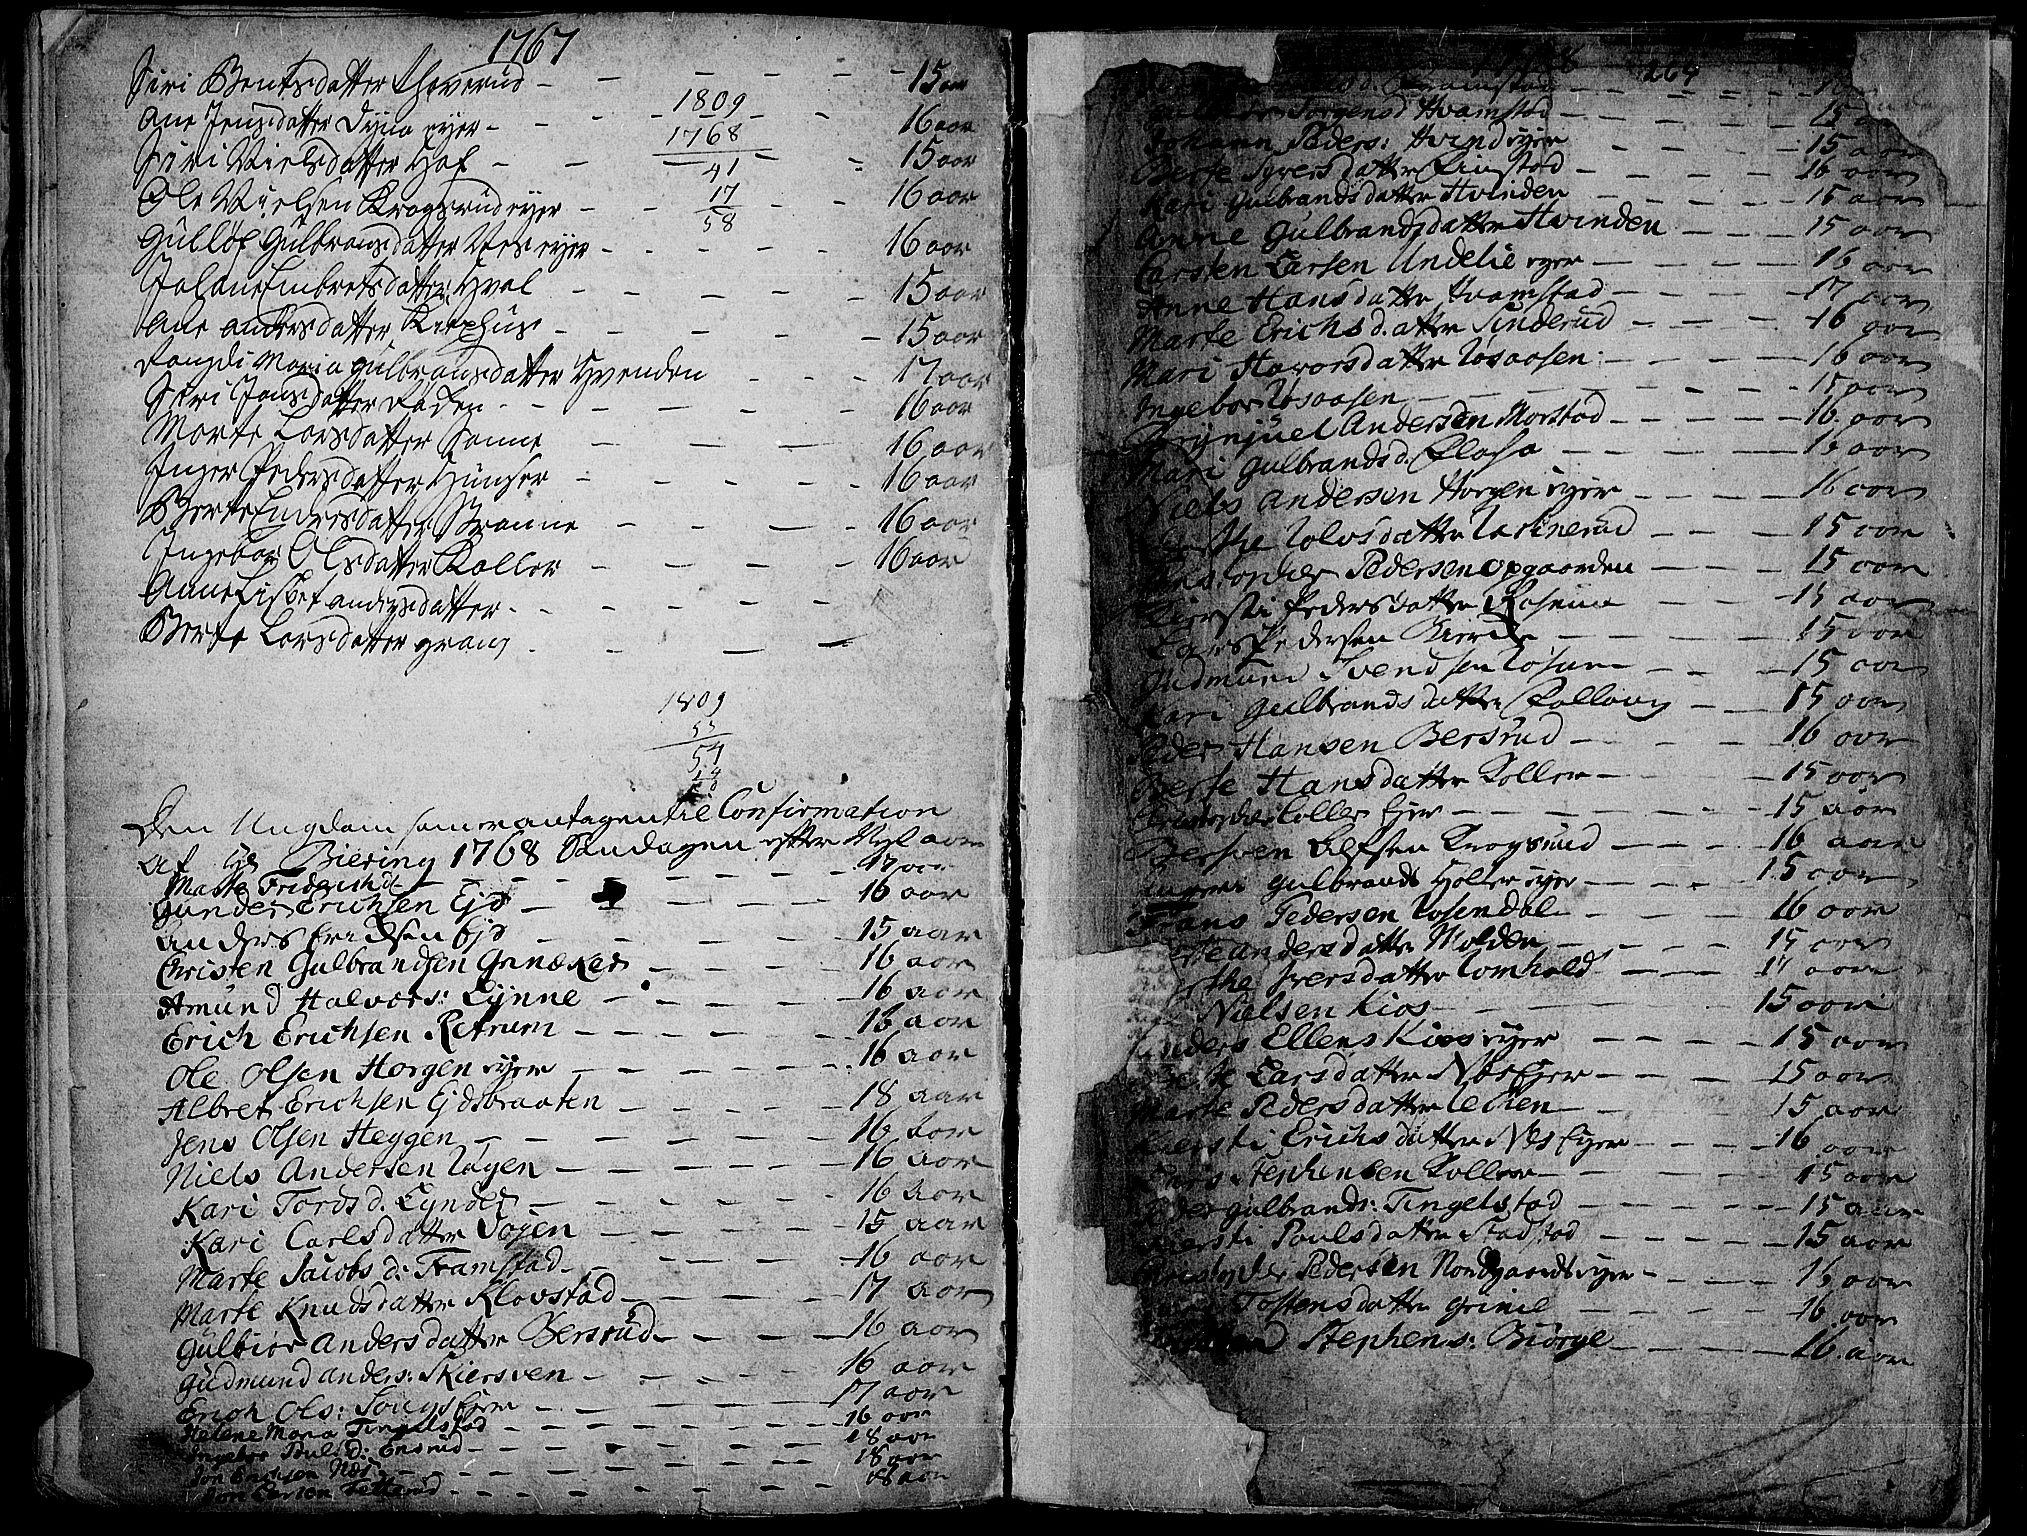 SAH, Gran prestekontor, Ministerialbok nr. 4, 1759-1775, s. 264